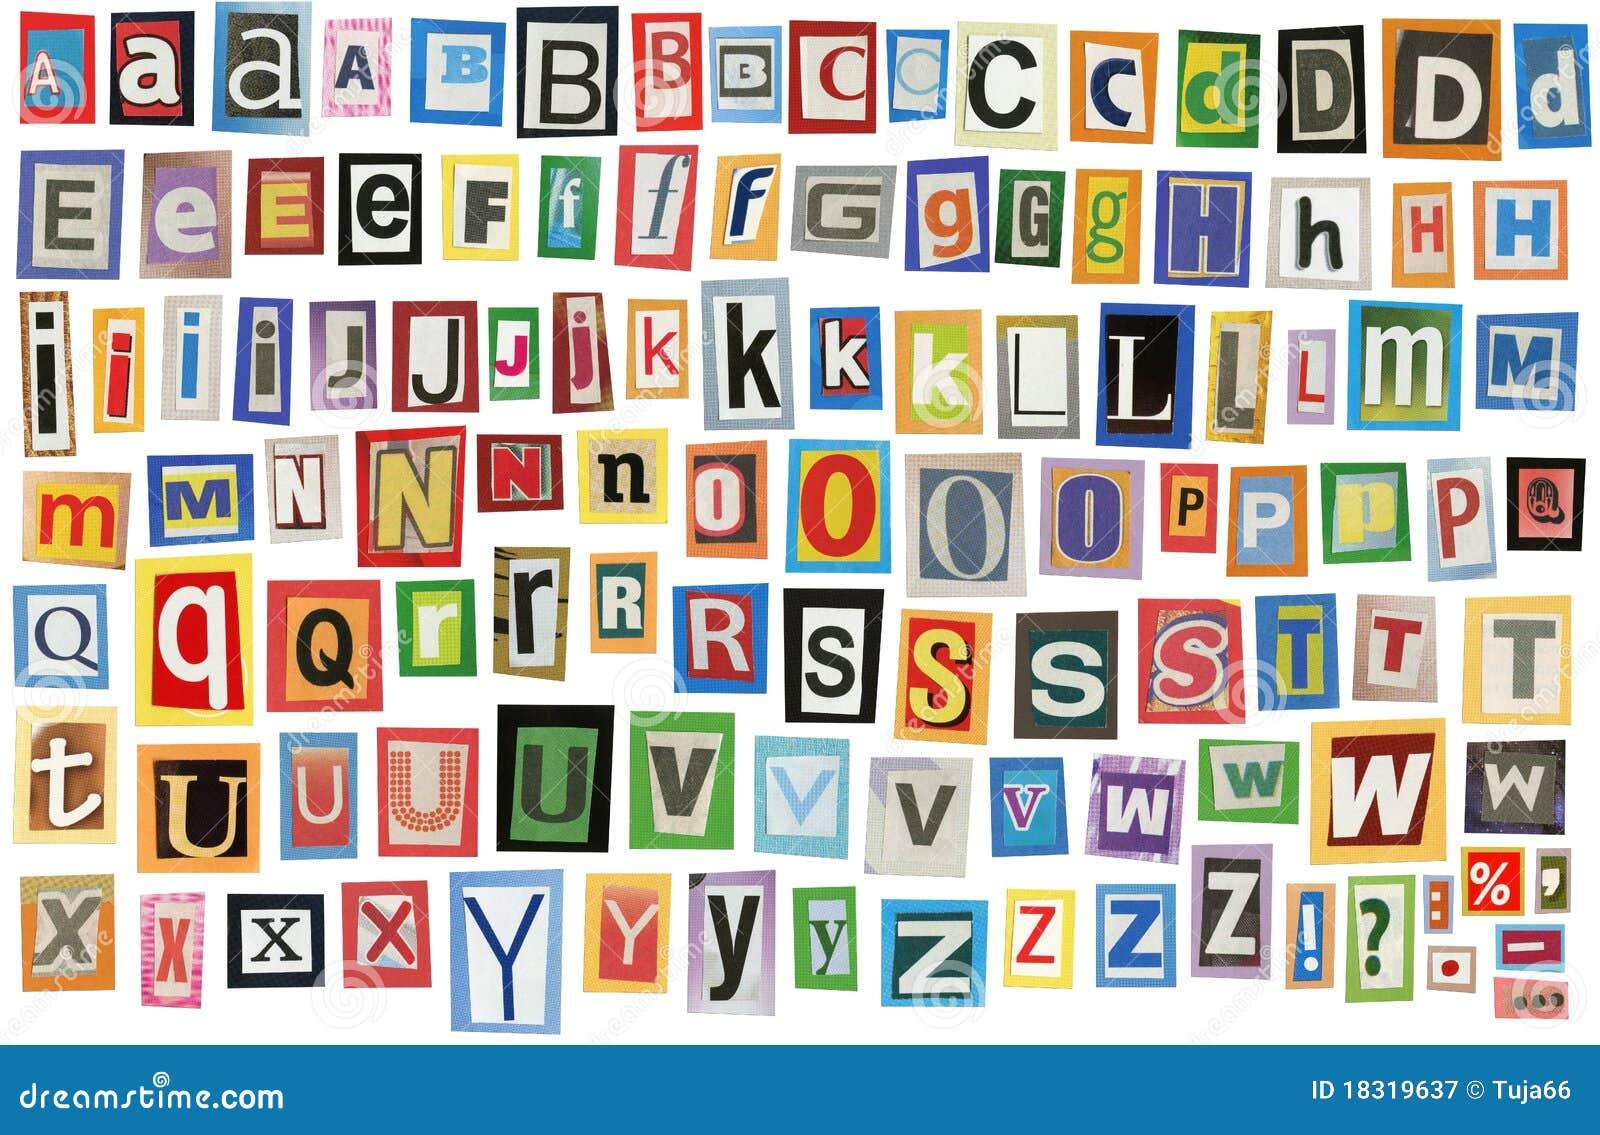 Newspaper Alphabet Royalty Free Stock Photography